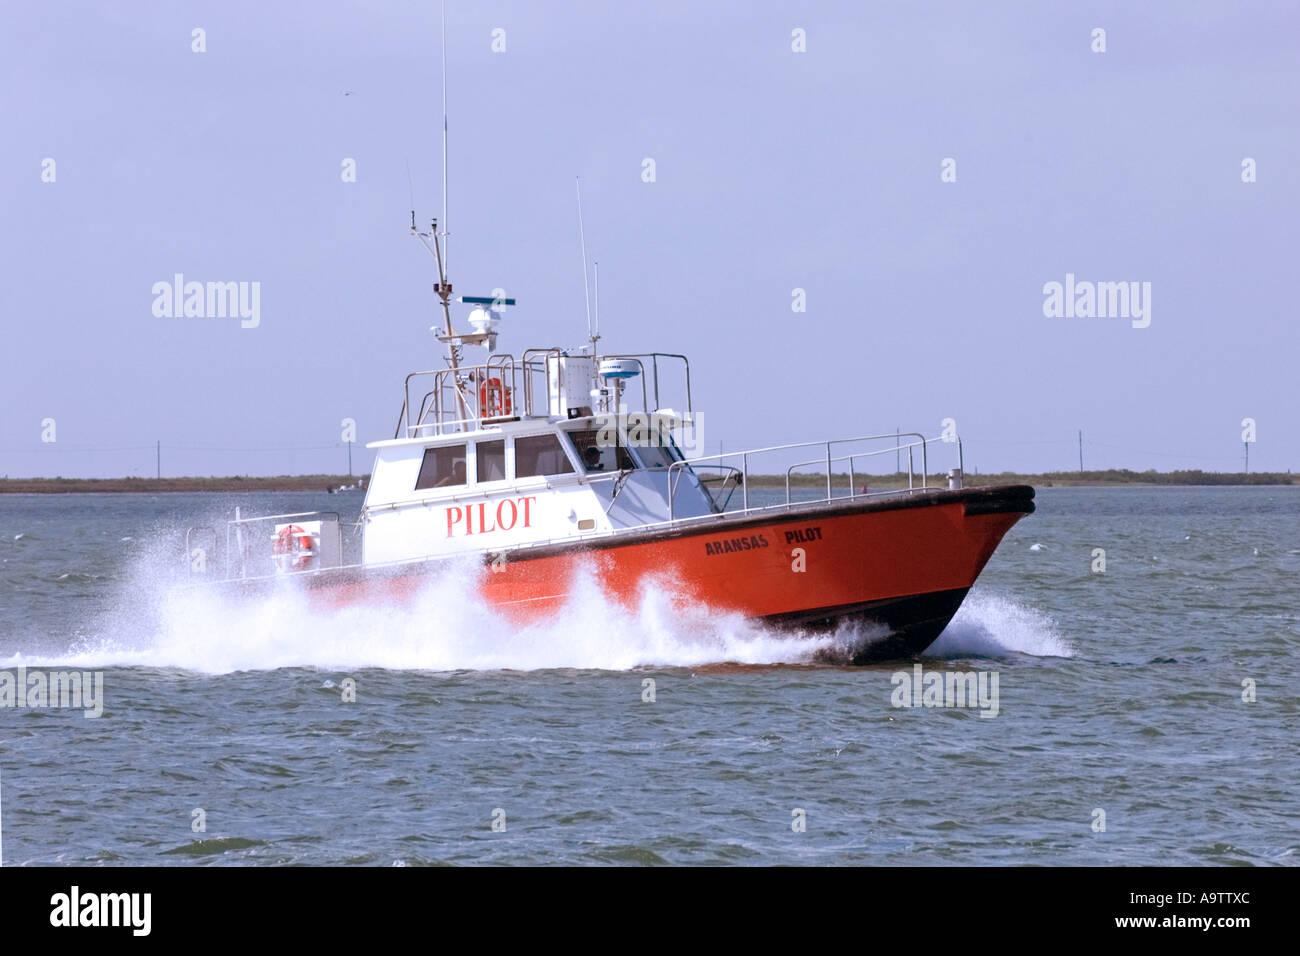 Pilot boat in Corpus Christi Bay Texas - Stock Image